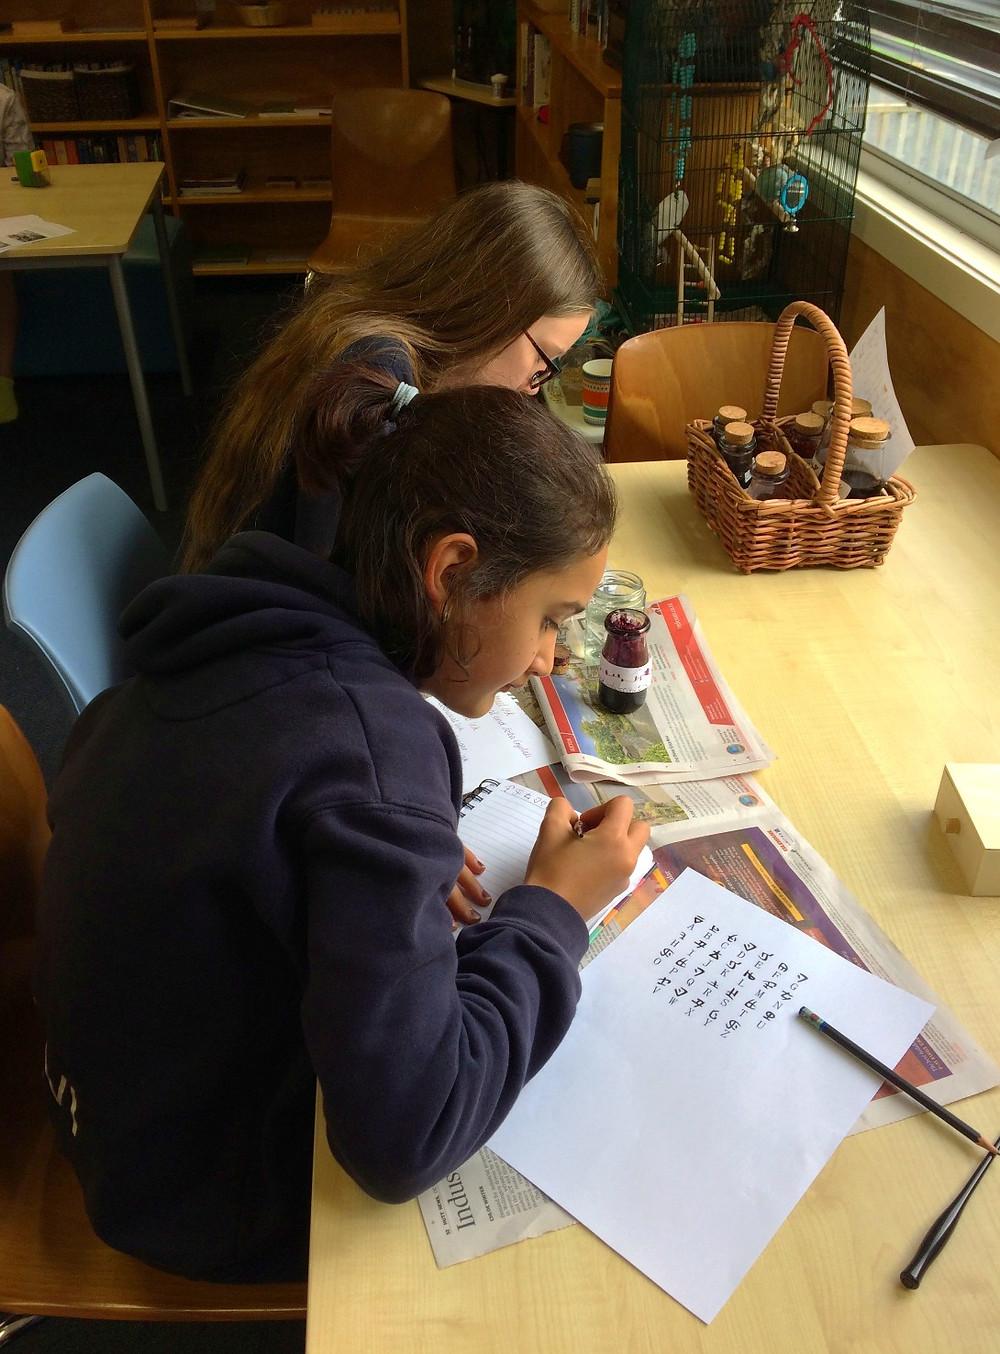 Ink work in a Montessori classroom